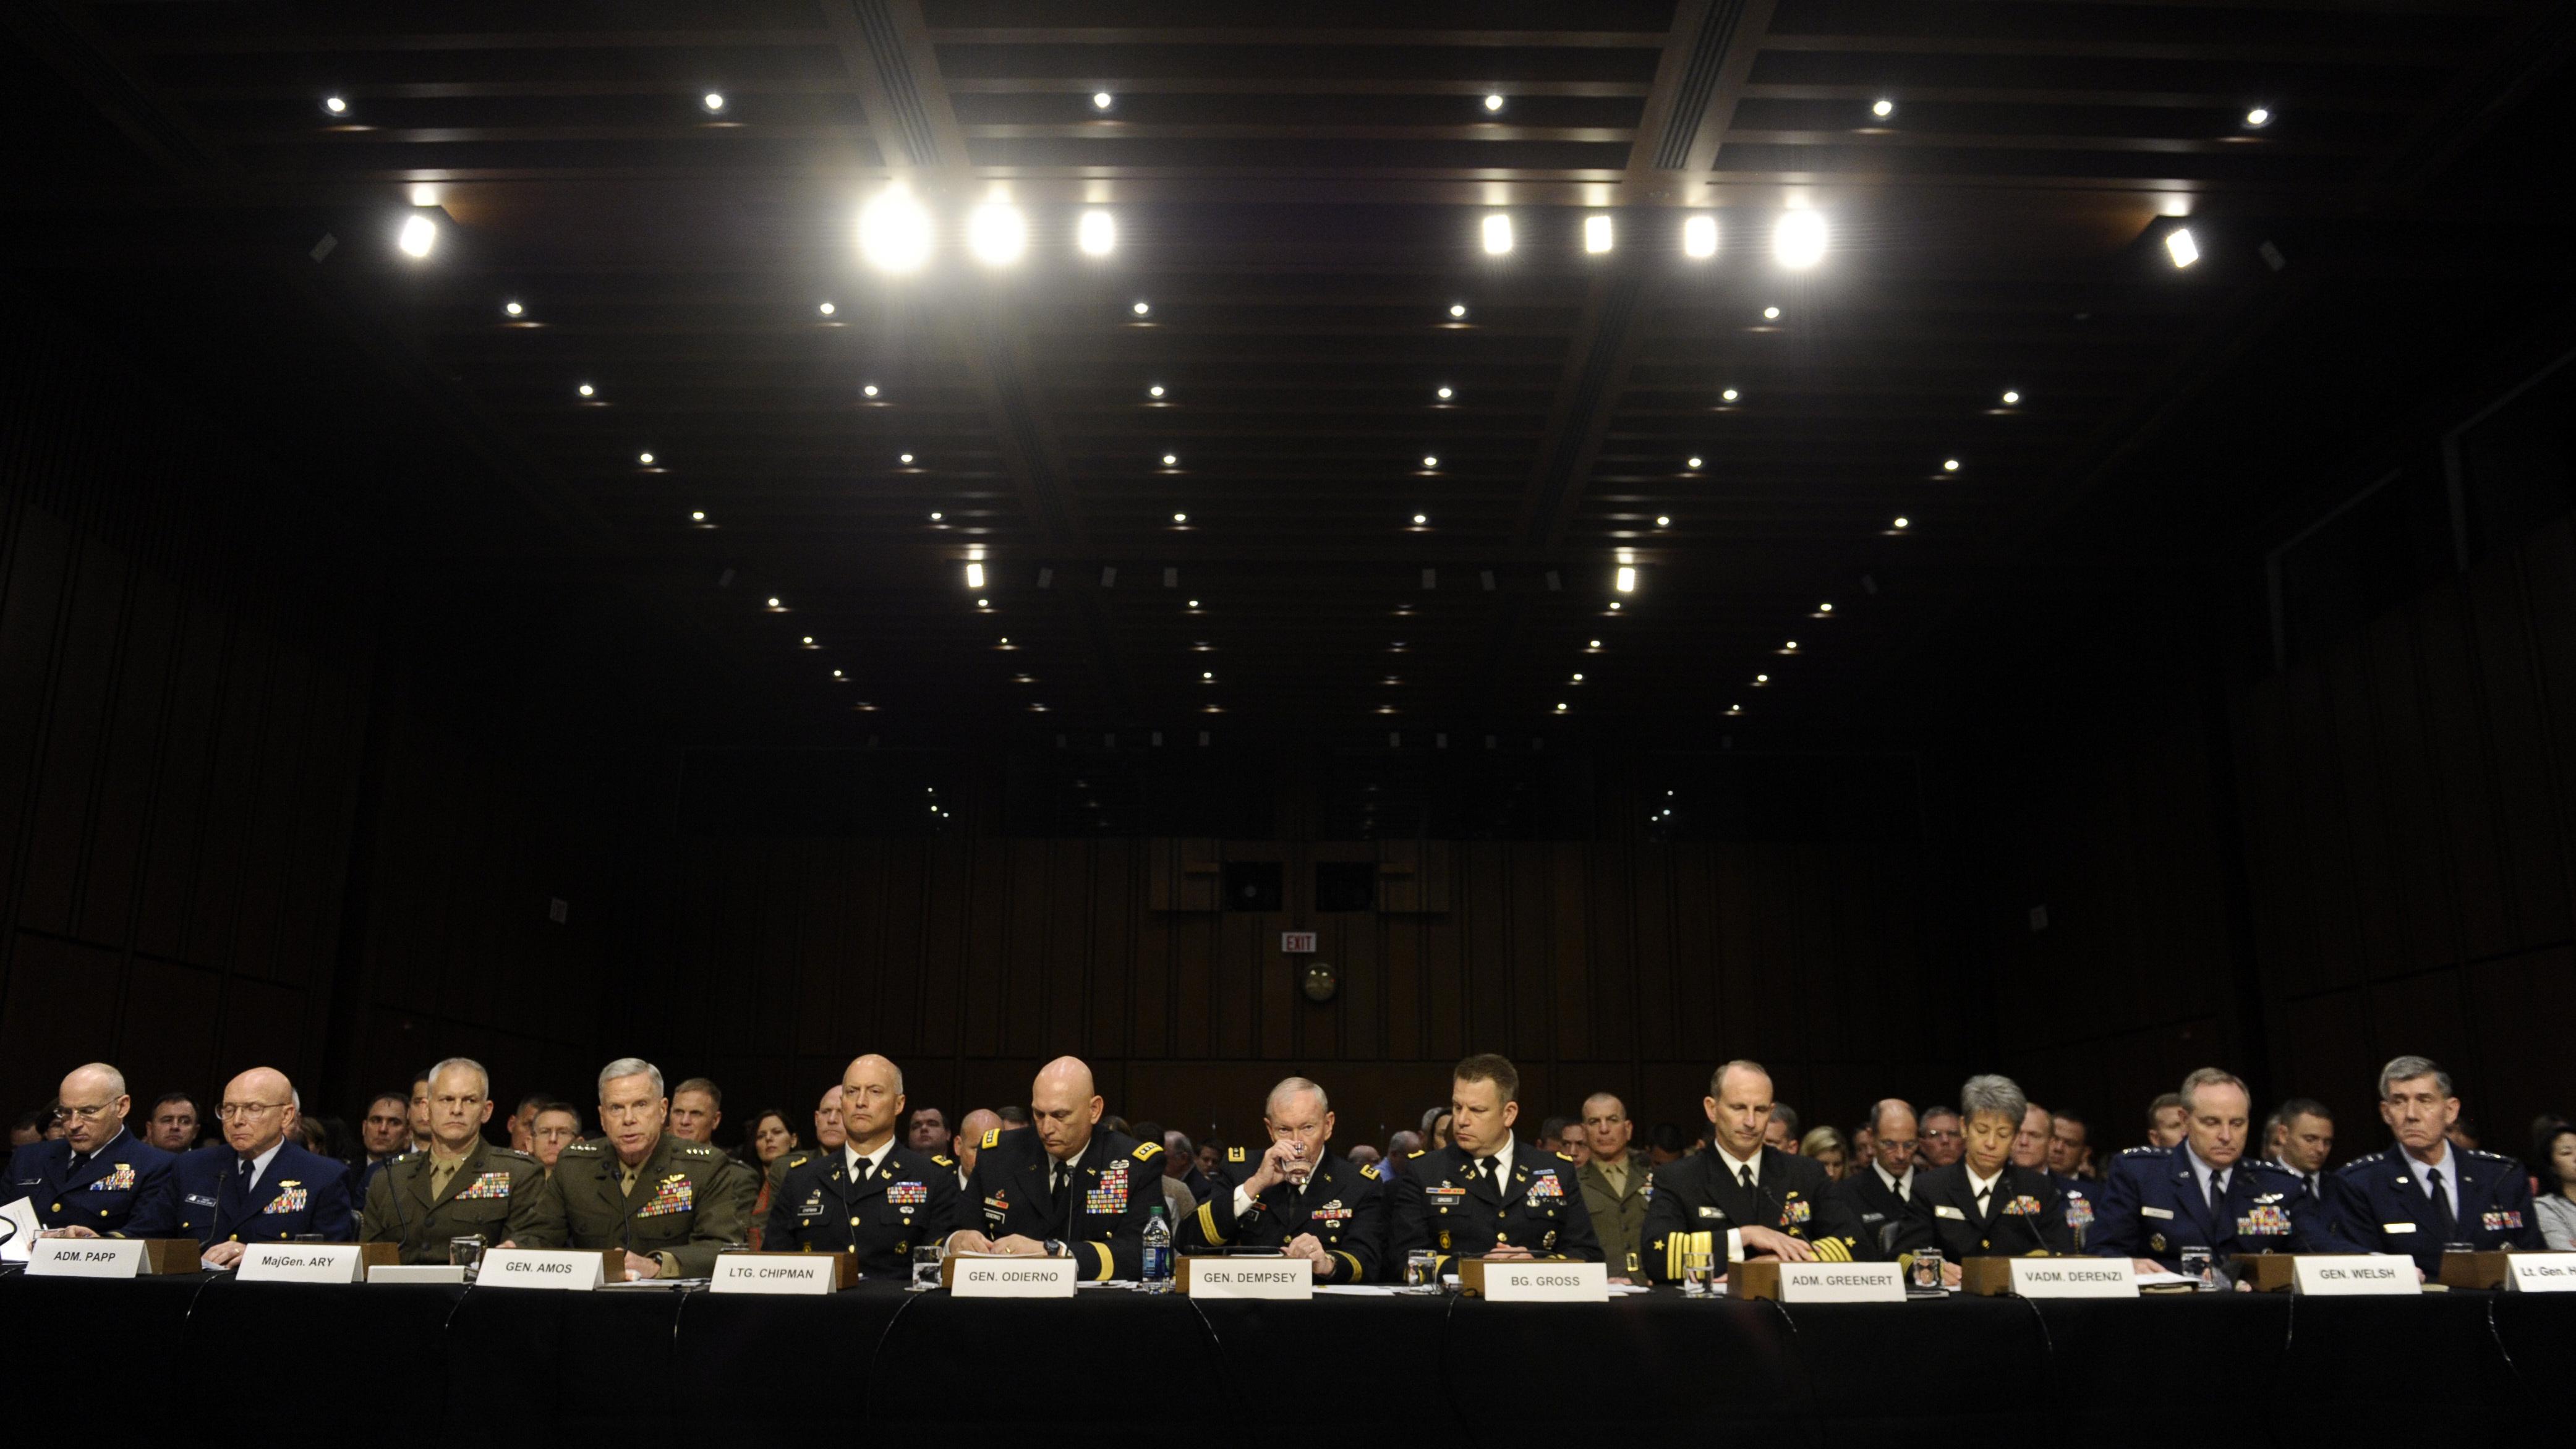 4 Big Players Emerge In Military Sexual Assault Debate